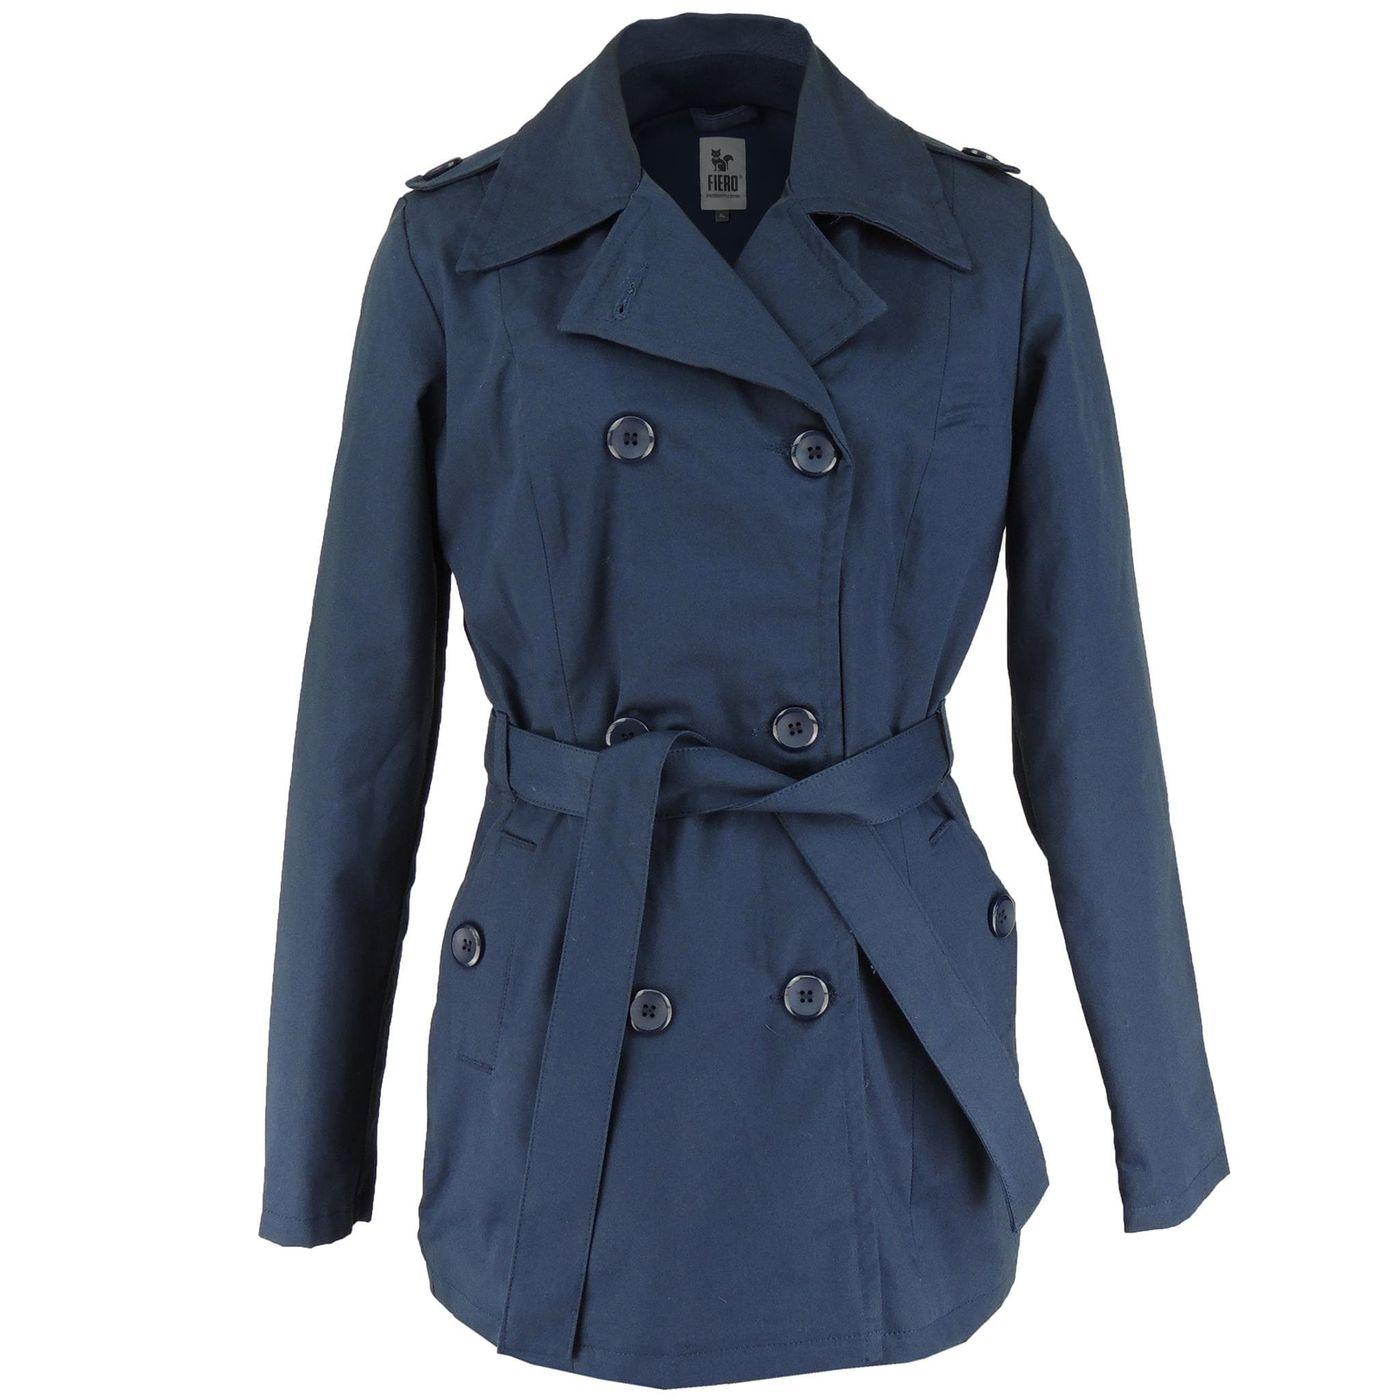 Casaco Térmico Feminino Trench Coat Azul Marinho Broadway - fieroshop c28fbbf9f8c6